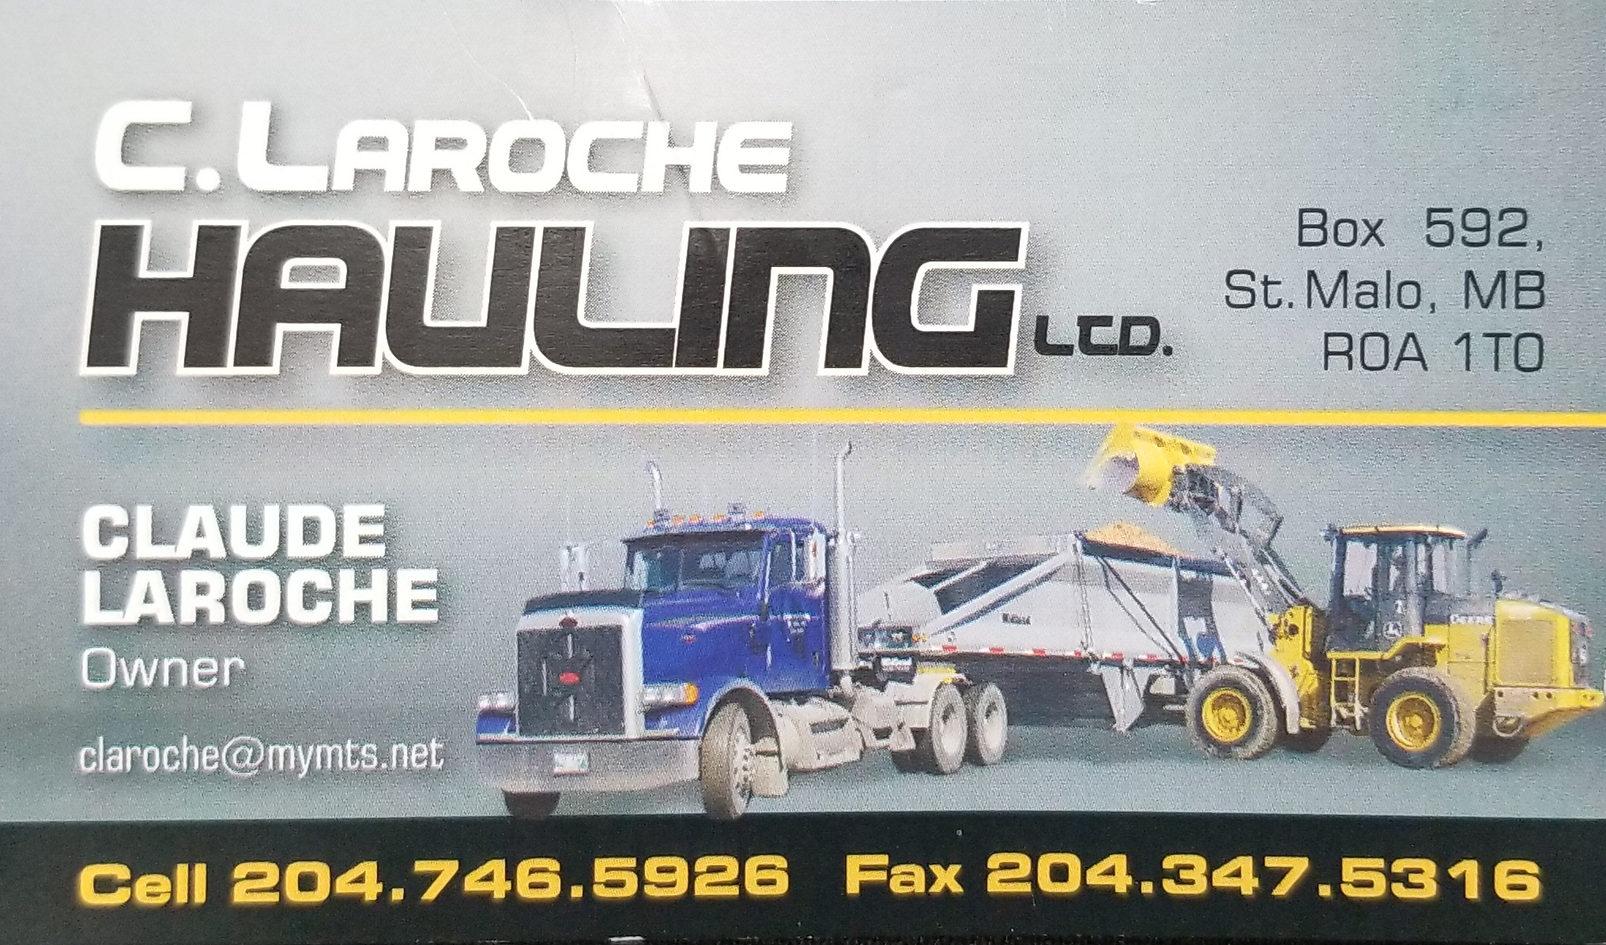 C. Laroche Hauling